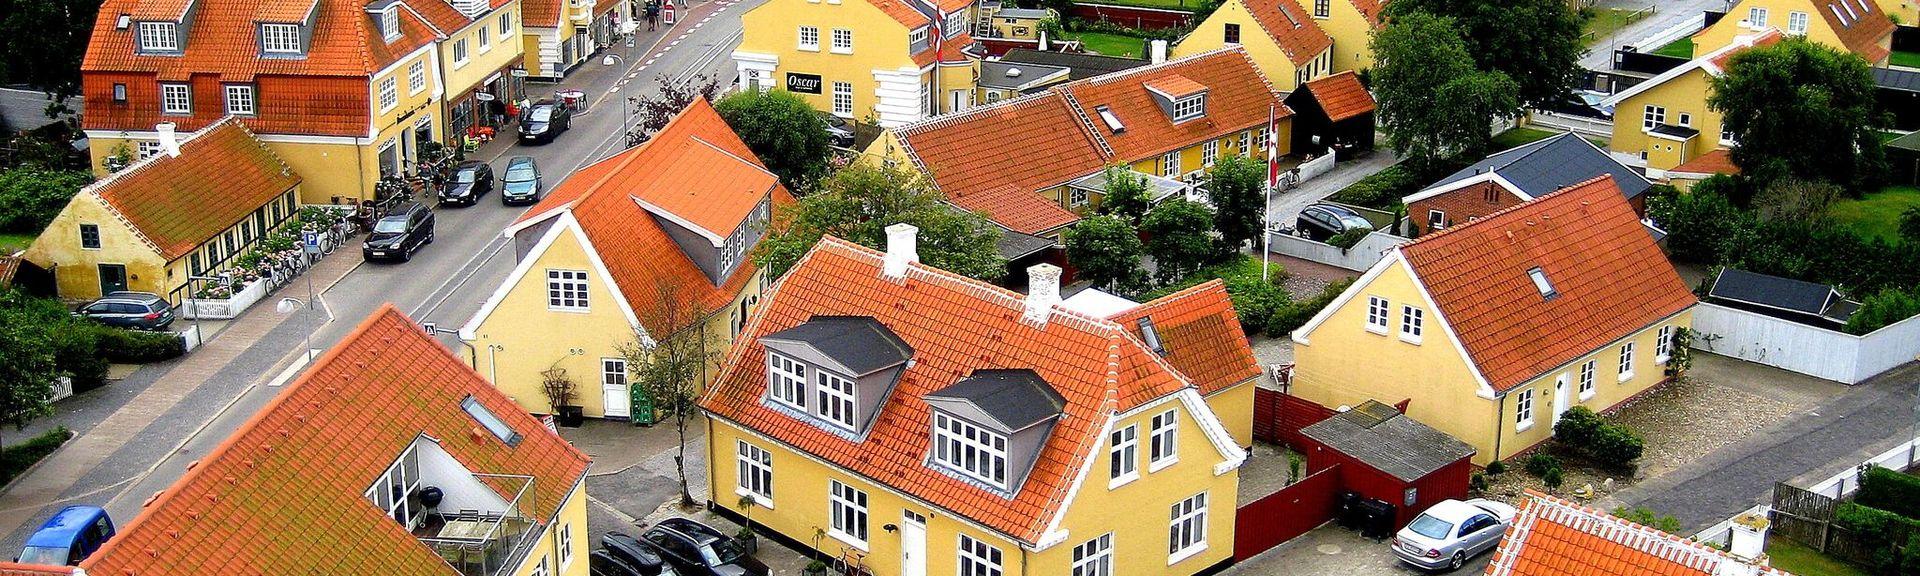 Skagen, Region Nordjylland, Danmark